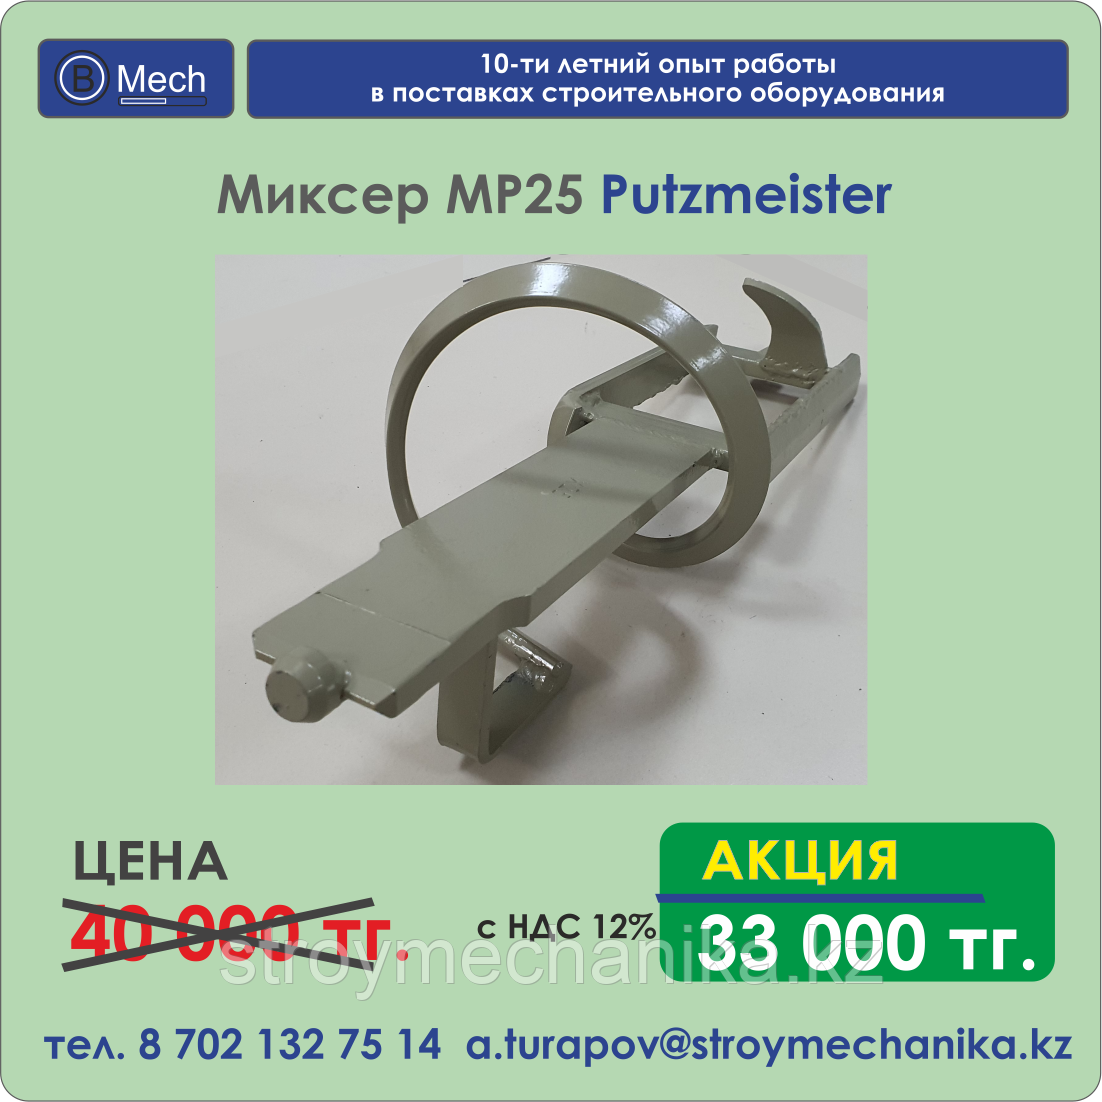 Миксер (смеситель) Пуцмейстер (Putzmeister) MP 25